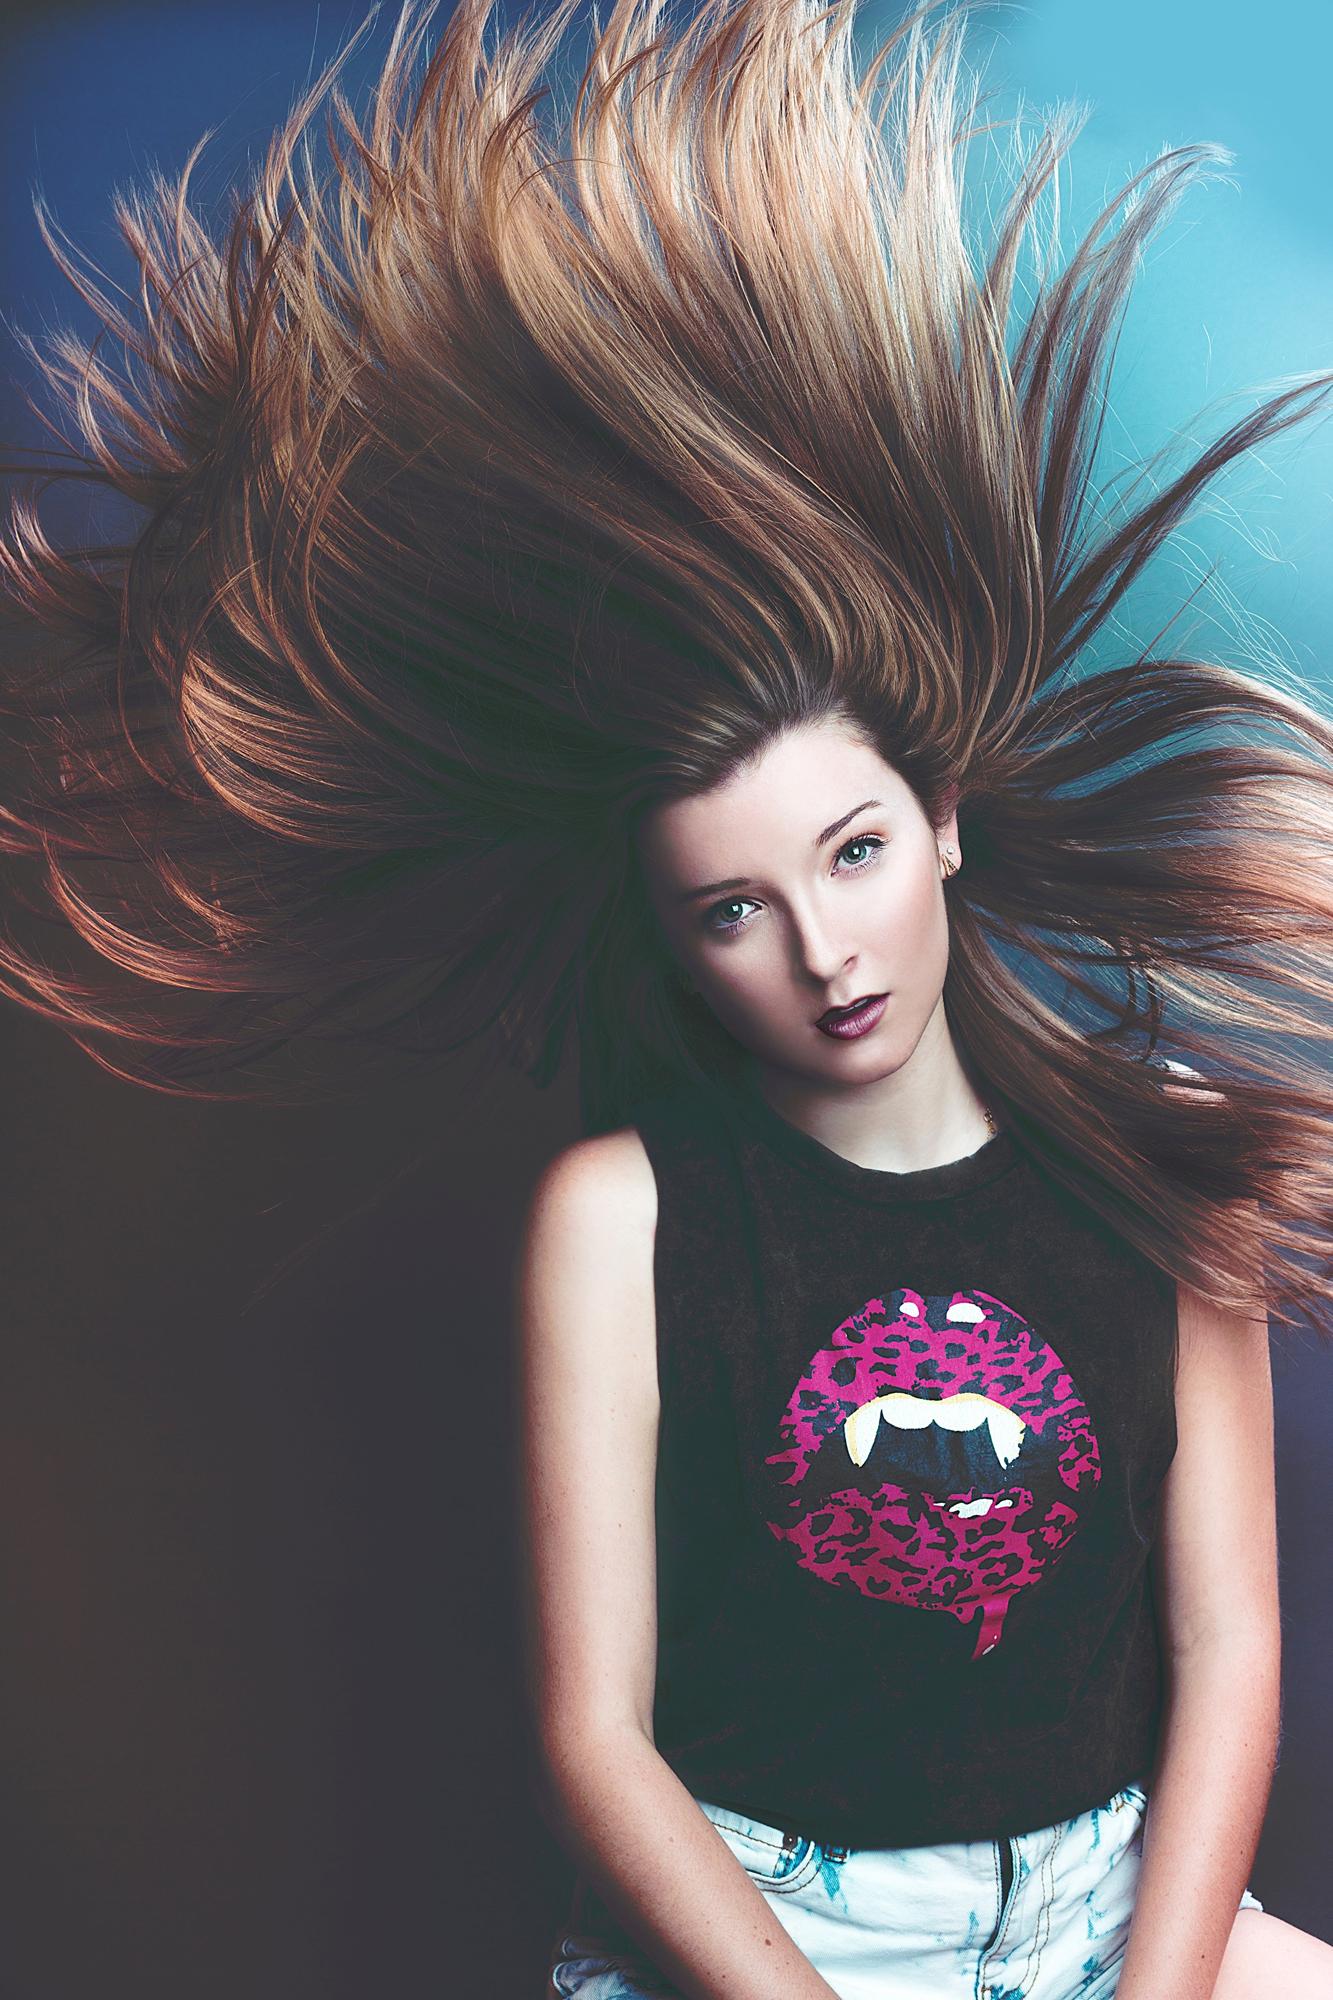 Harana Zhang (PARANA Studio) - Lindsay Christie - hair makeup Jennifer Beverly - lighting Corday Cardwell - retoucher by photog and lighting